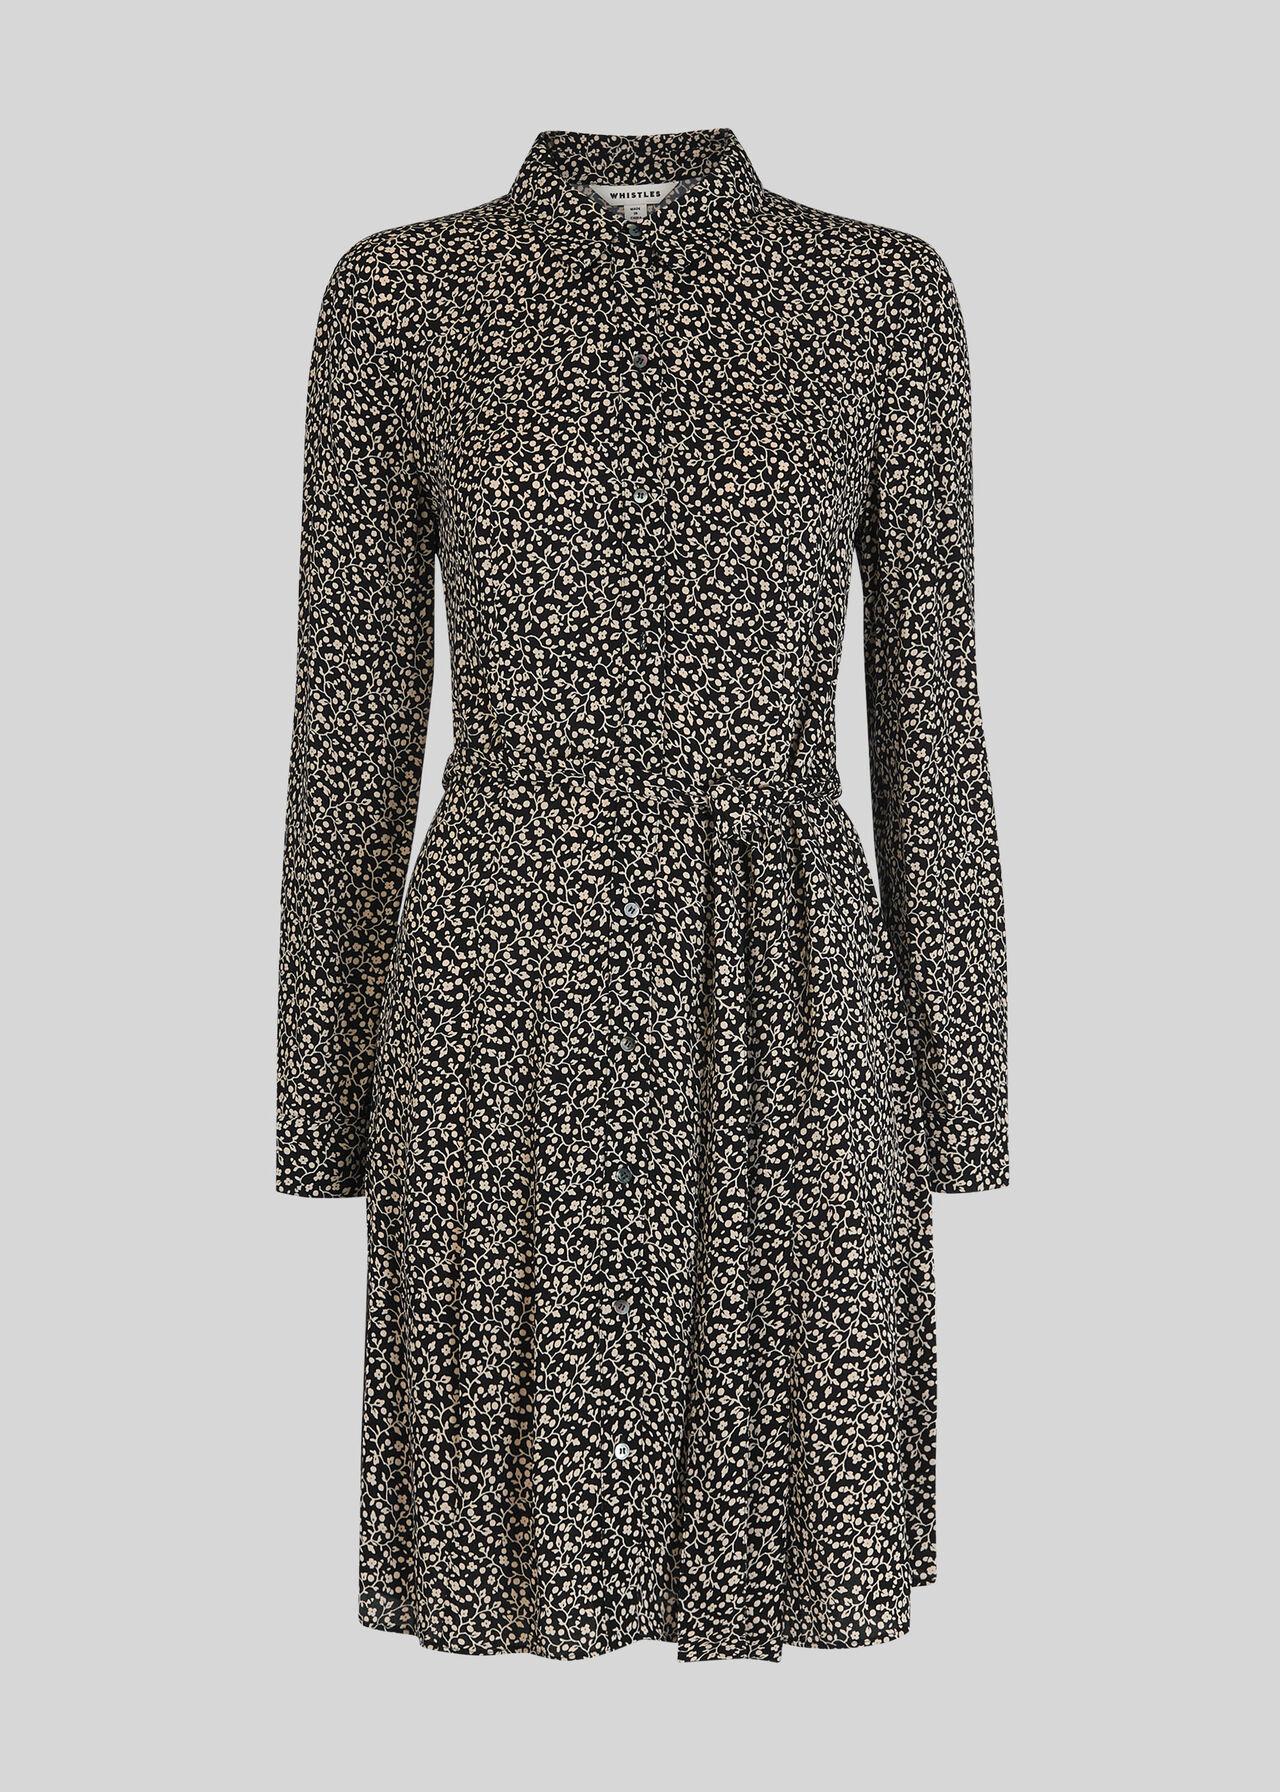 Autumn Floral Shirt Dress Black/Multi